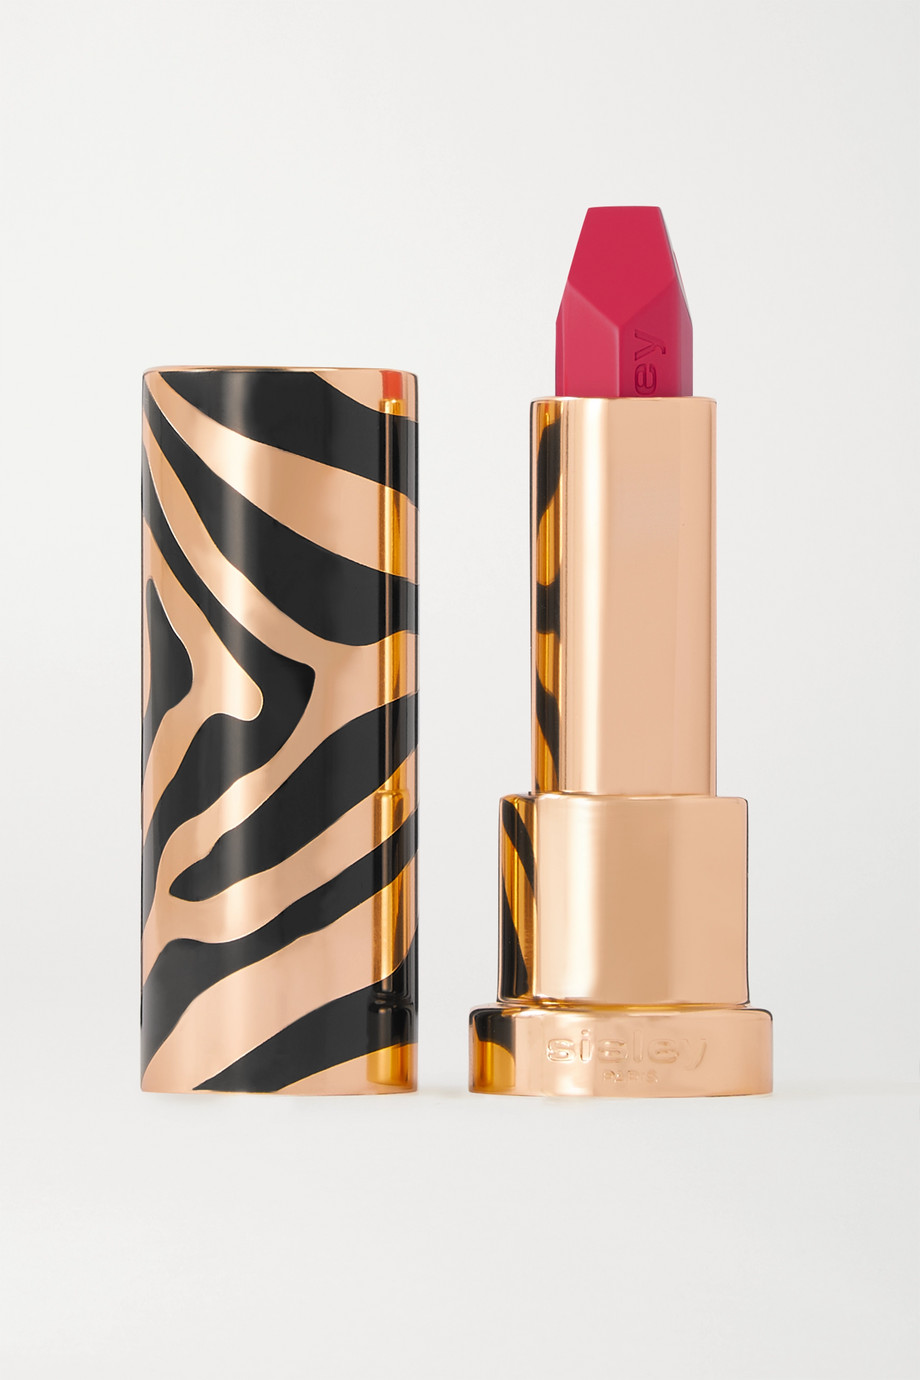 Sisley Le Phyto Rouge Lipstick - 29 Rose Mexico